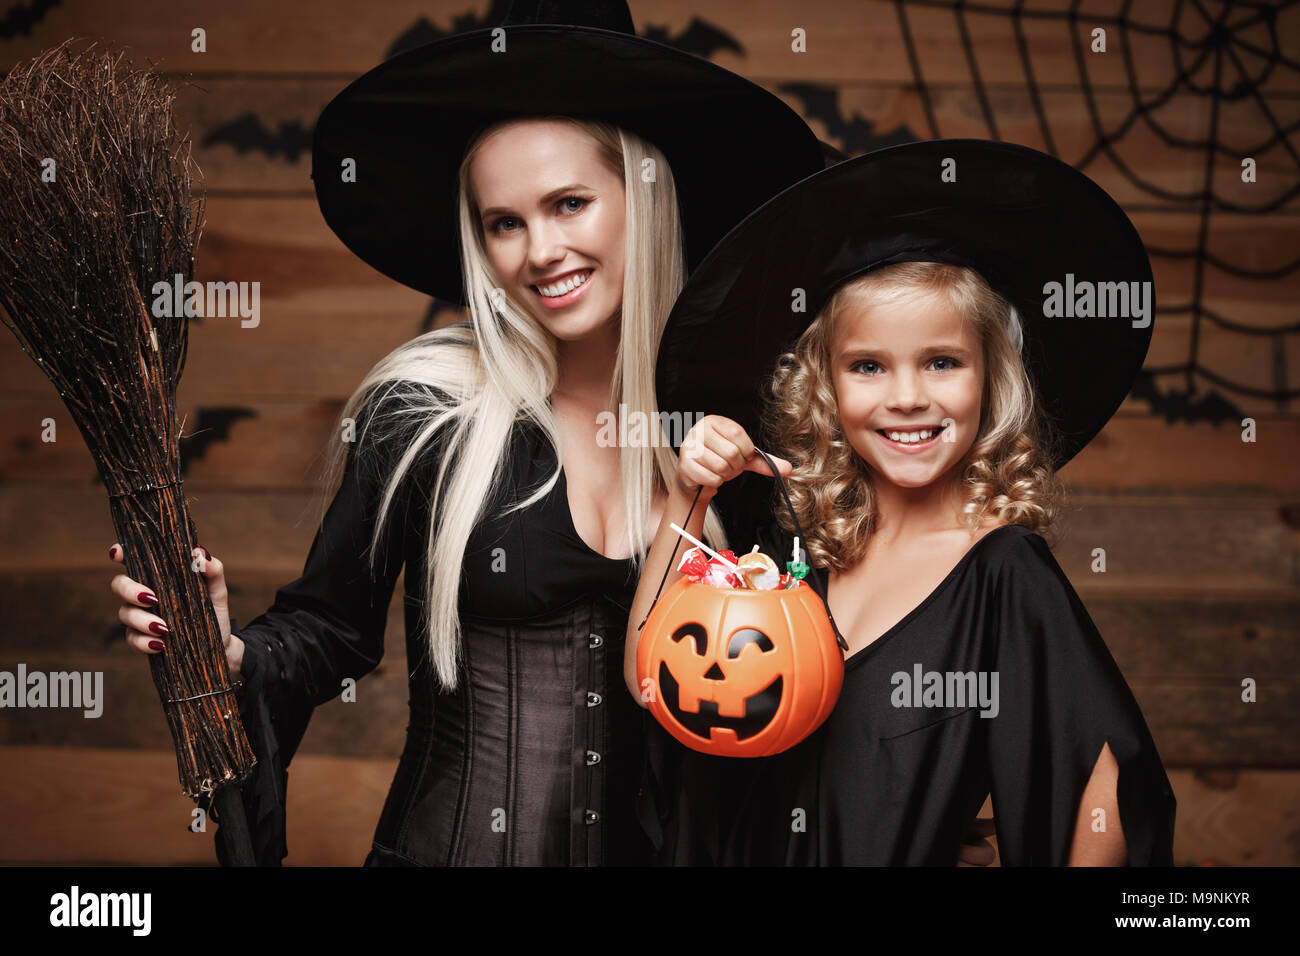 Kids Halloween Stockfotos & Kids Halloween Bilder - Seite 2 - Alamy